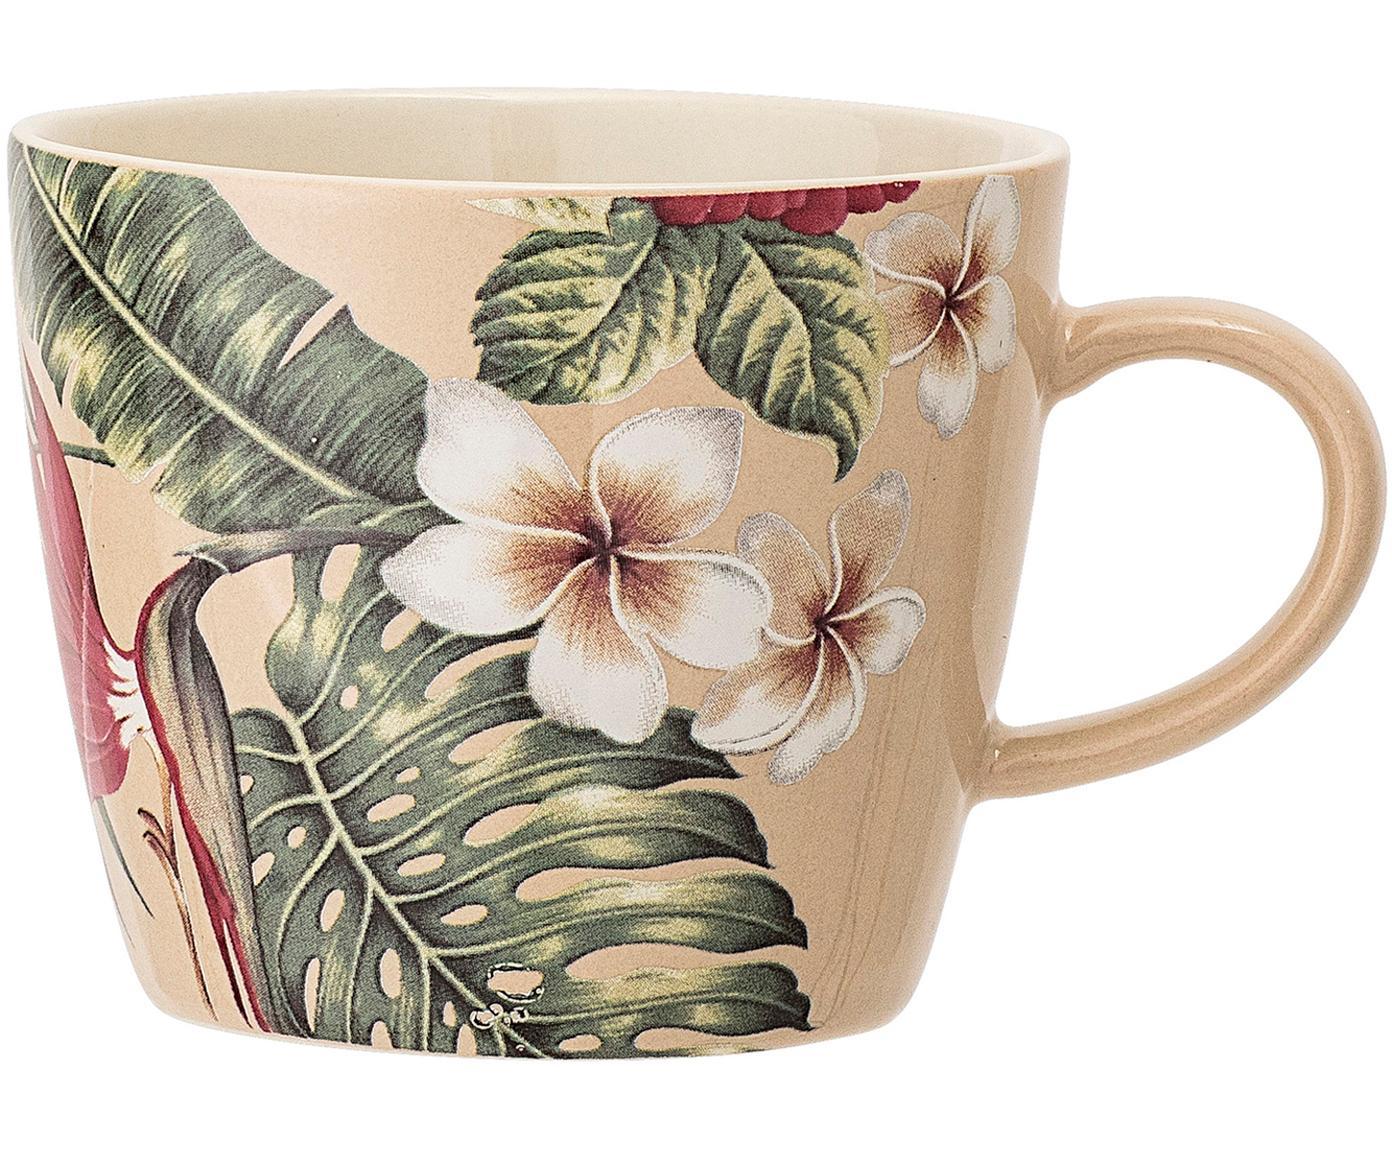 Koffiemokken Aruba, 2 stuks, Keramiek, Crèmewit, groen, rood, Ø 10 x H 8 cm